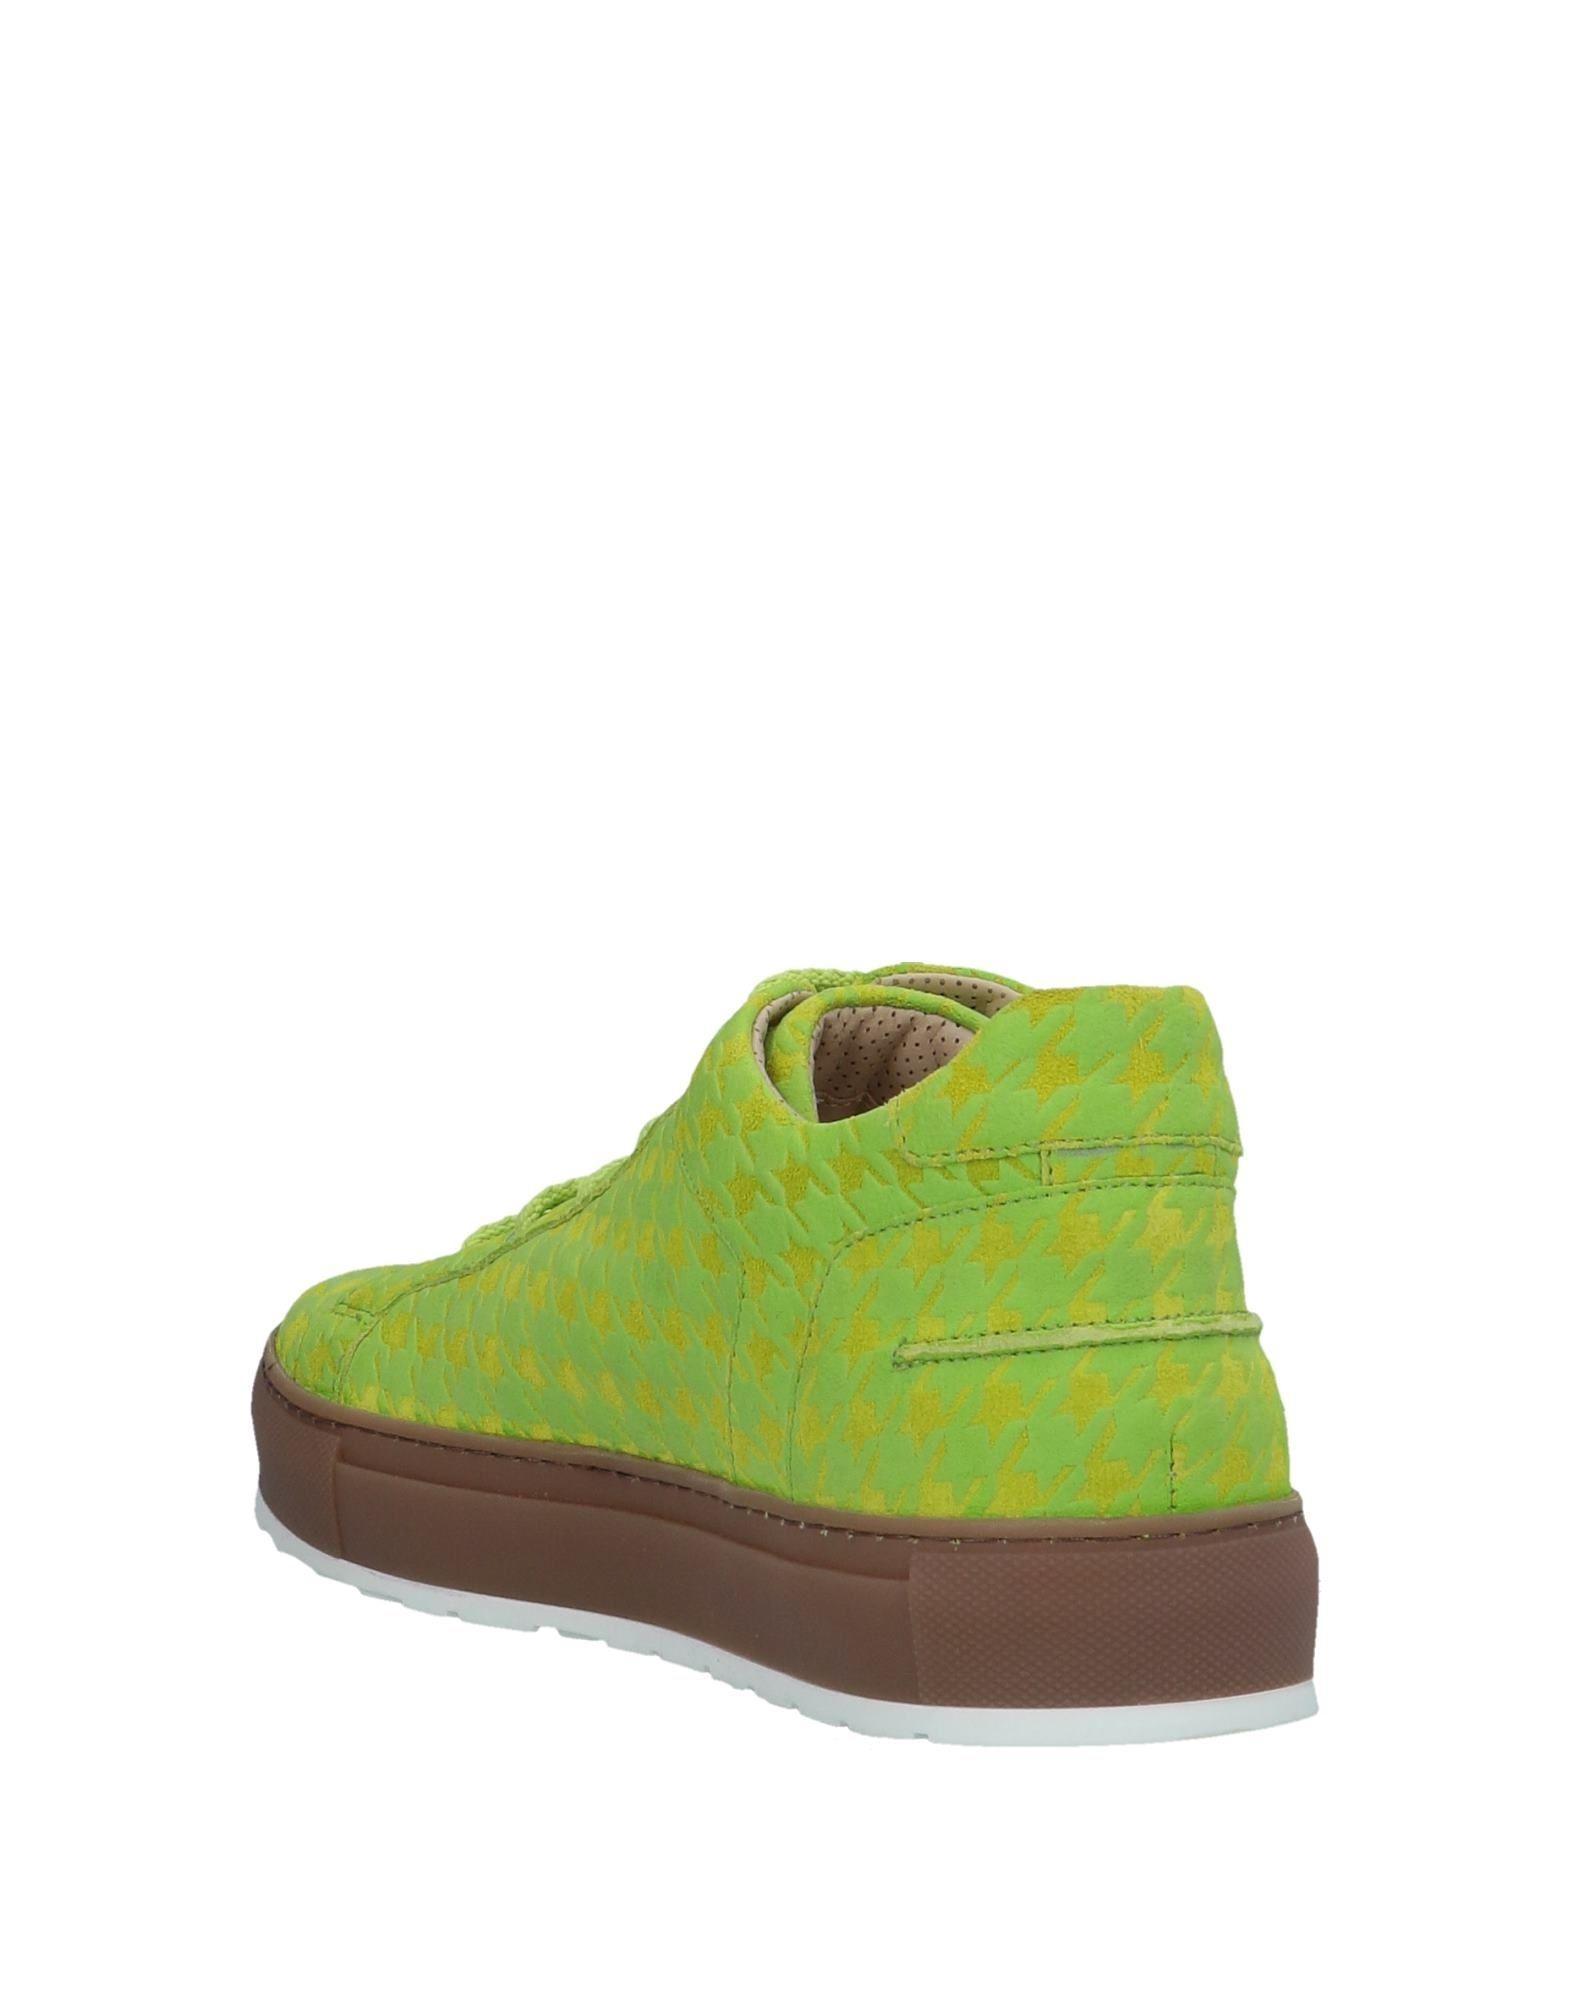 A.Testoni Low Sneakers & Tennisschuhe in Grün für Herren yGO3n